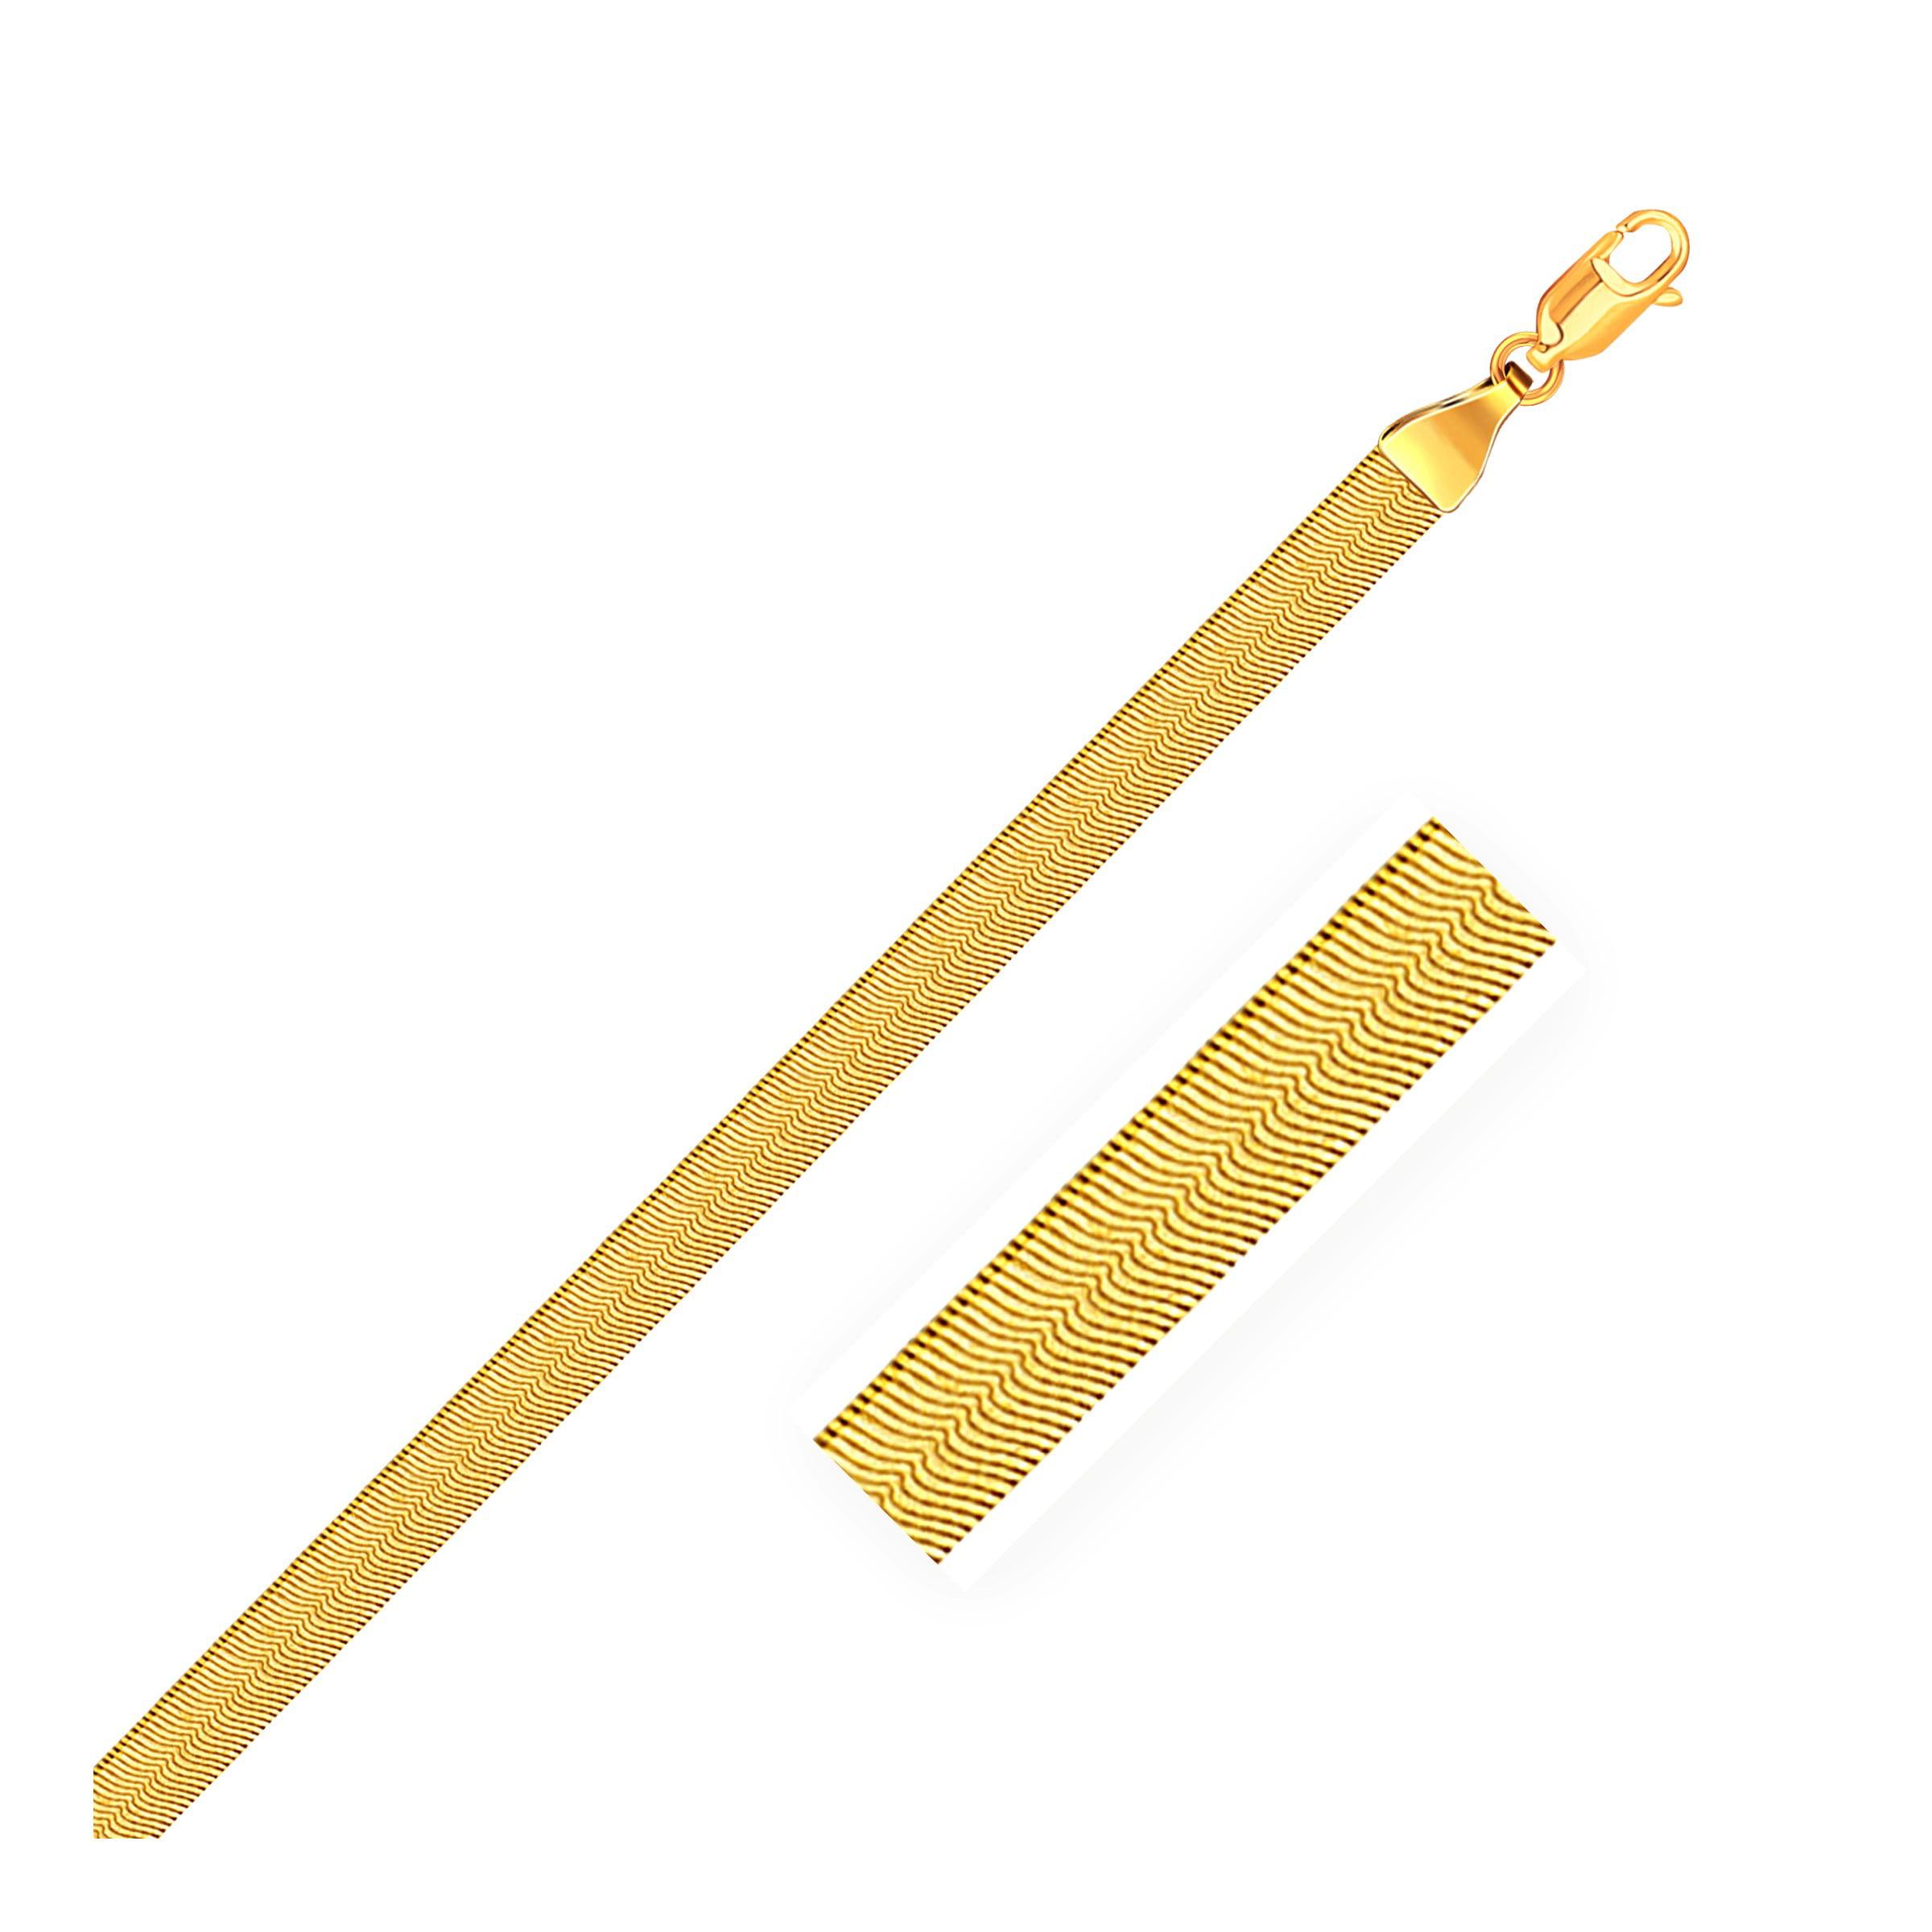 "5.0mm 14K Yellow Gold Super Flex Herringbone Bracelet 8"" by Mia Diamonds"